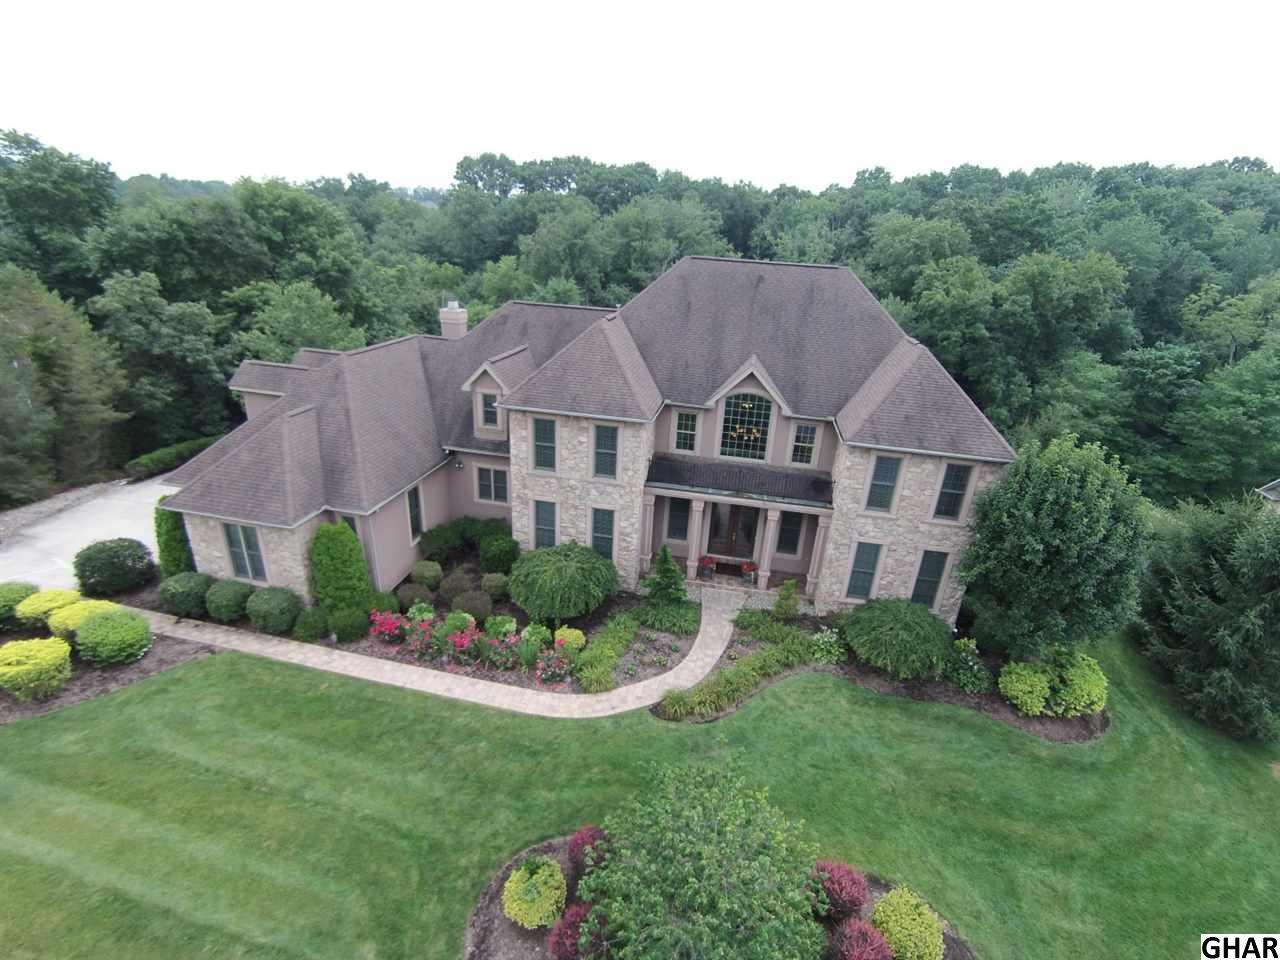 Real Estate for Sale, ListingId: 34614095, Mechanicsburg,PA17050